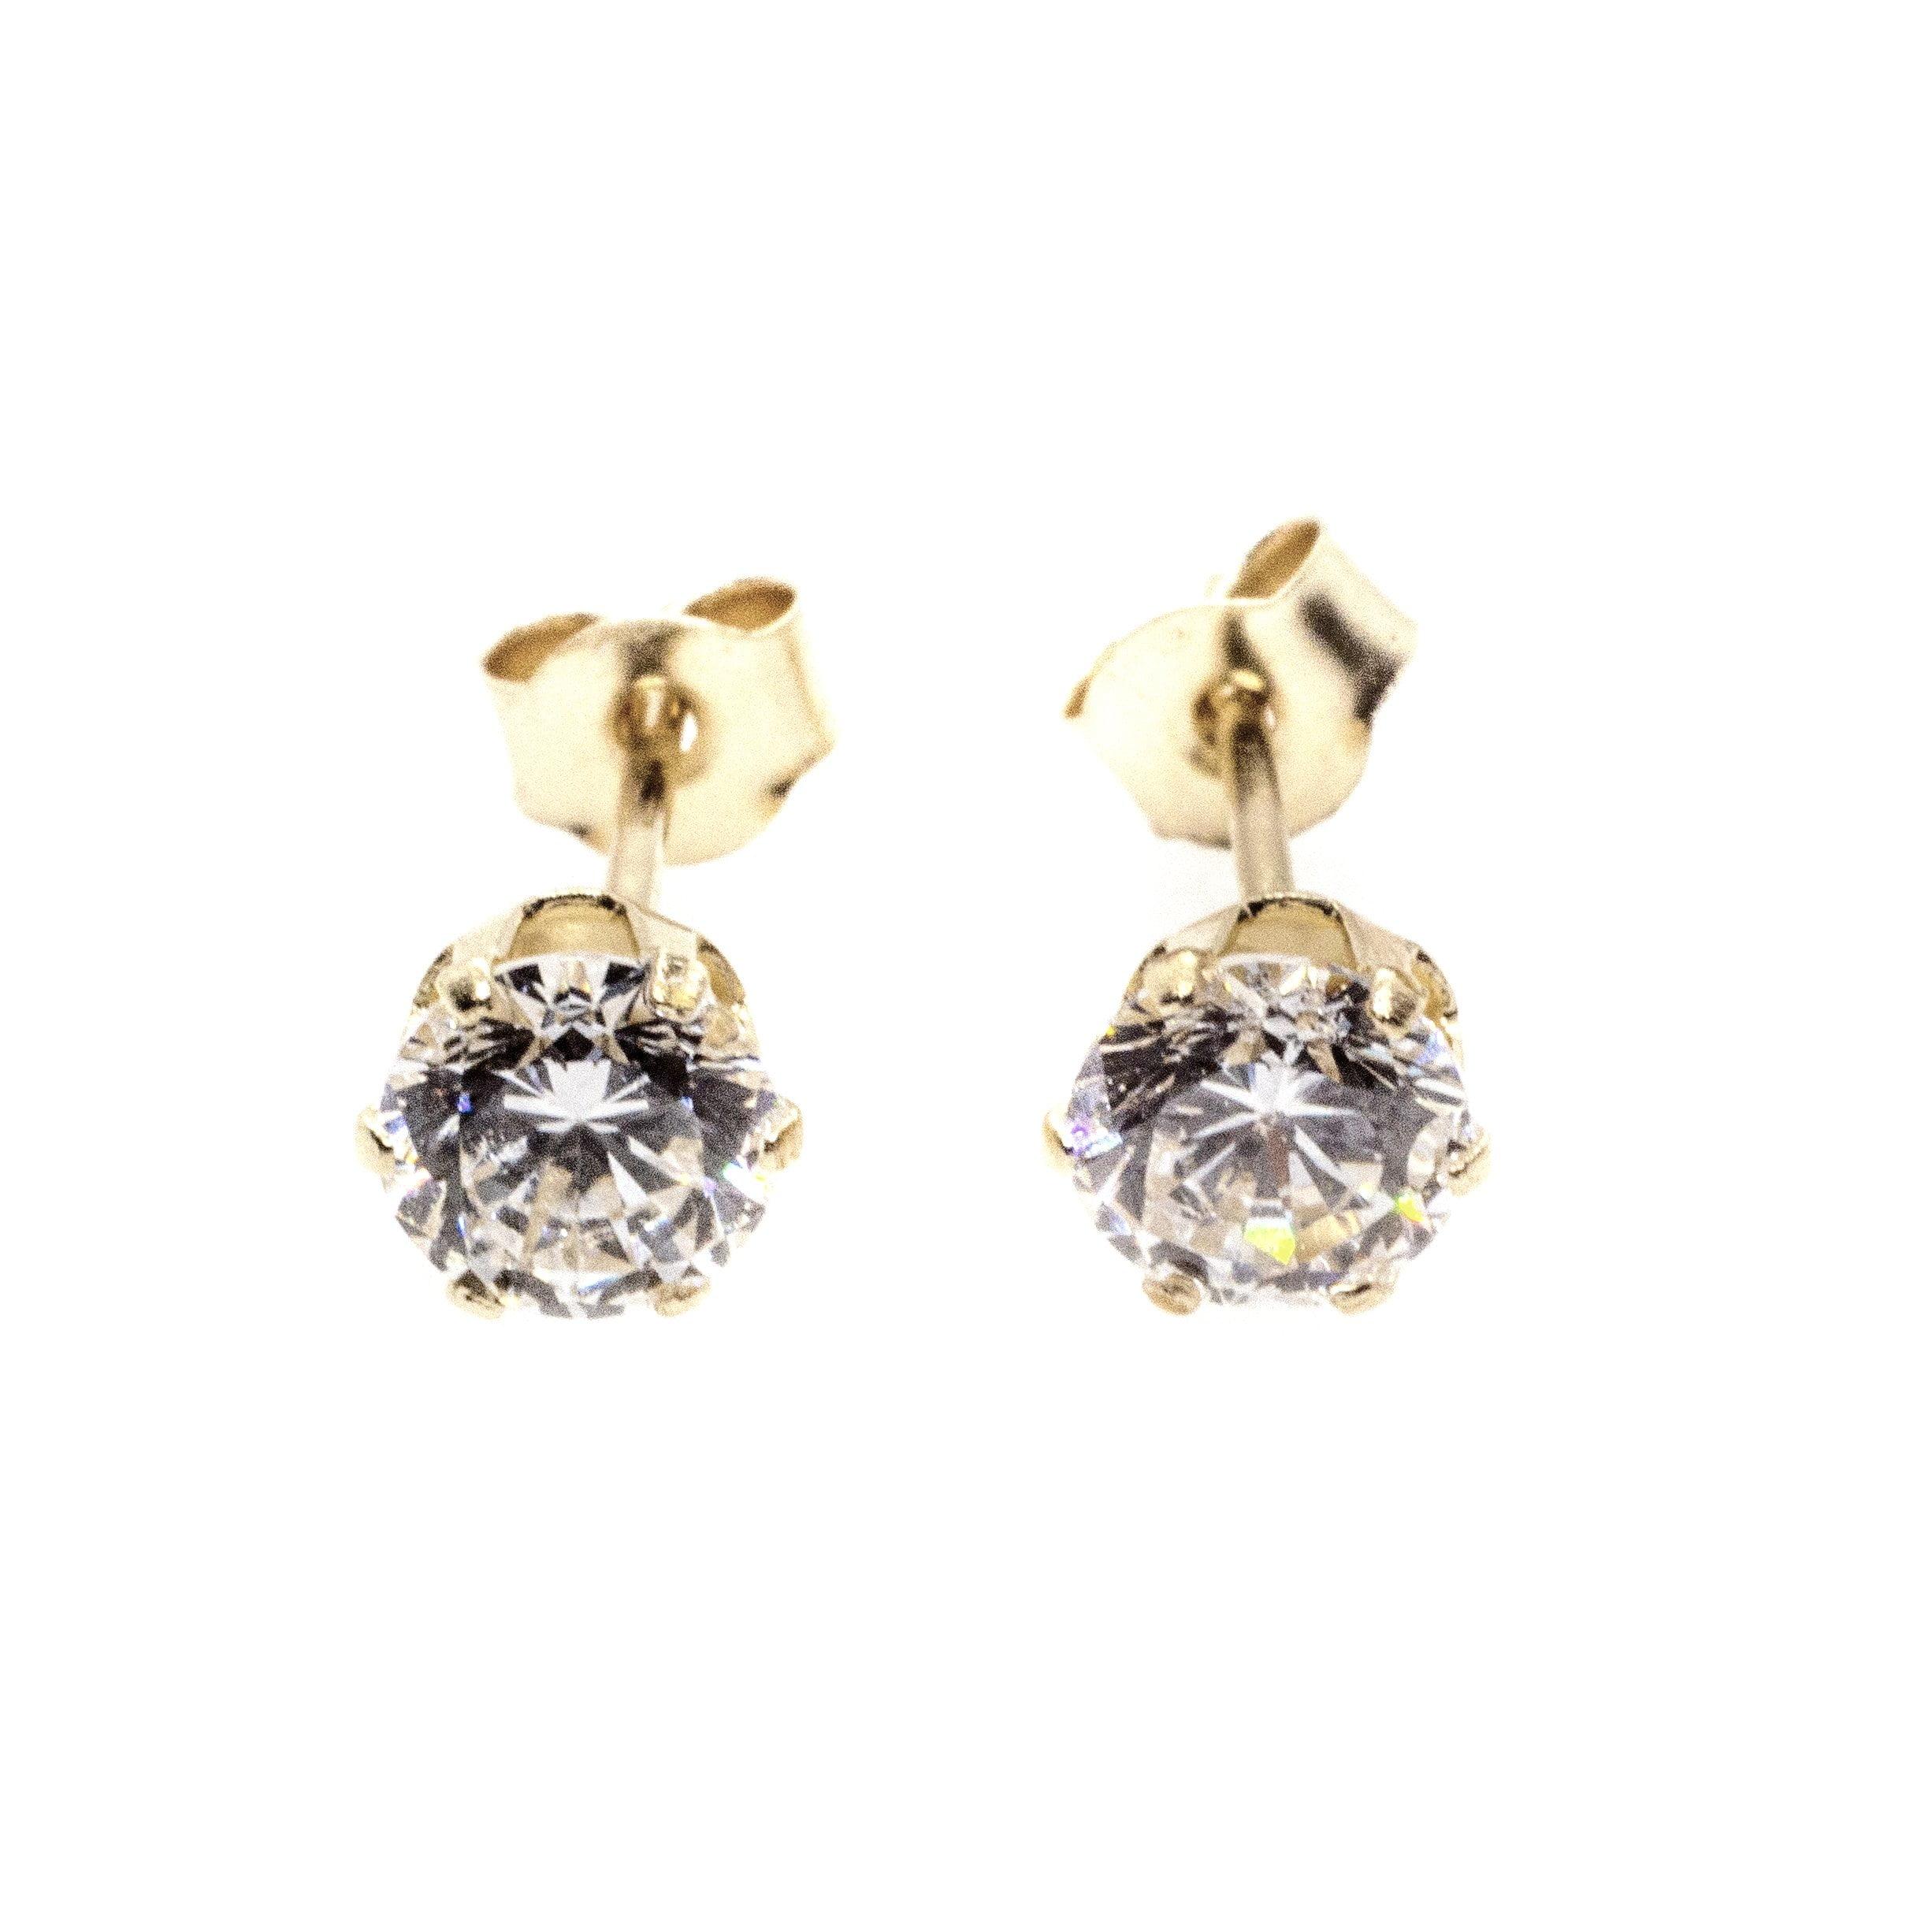 3mm CZ stud earrings 9ct yellow gold alt 4